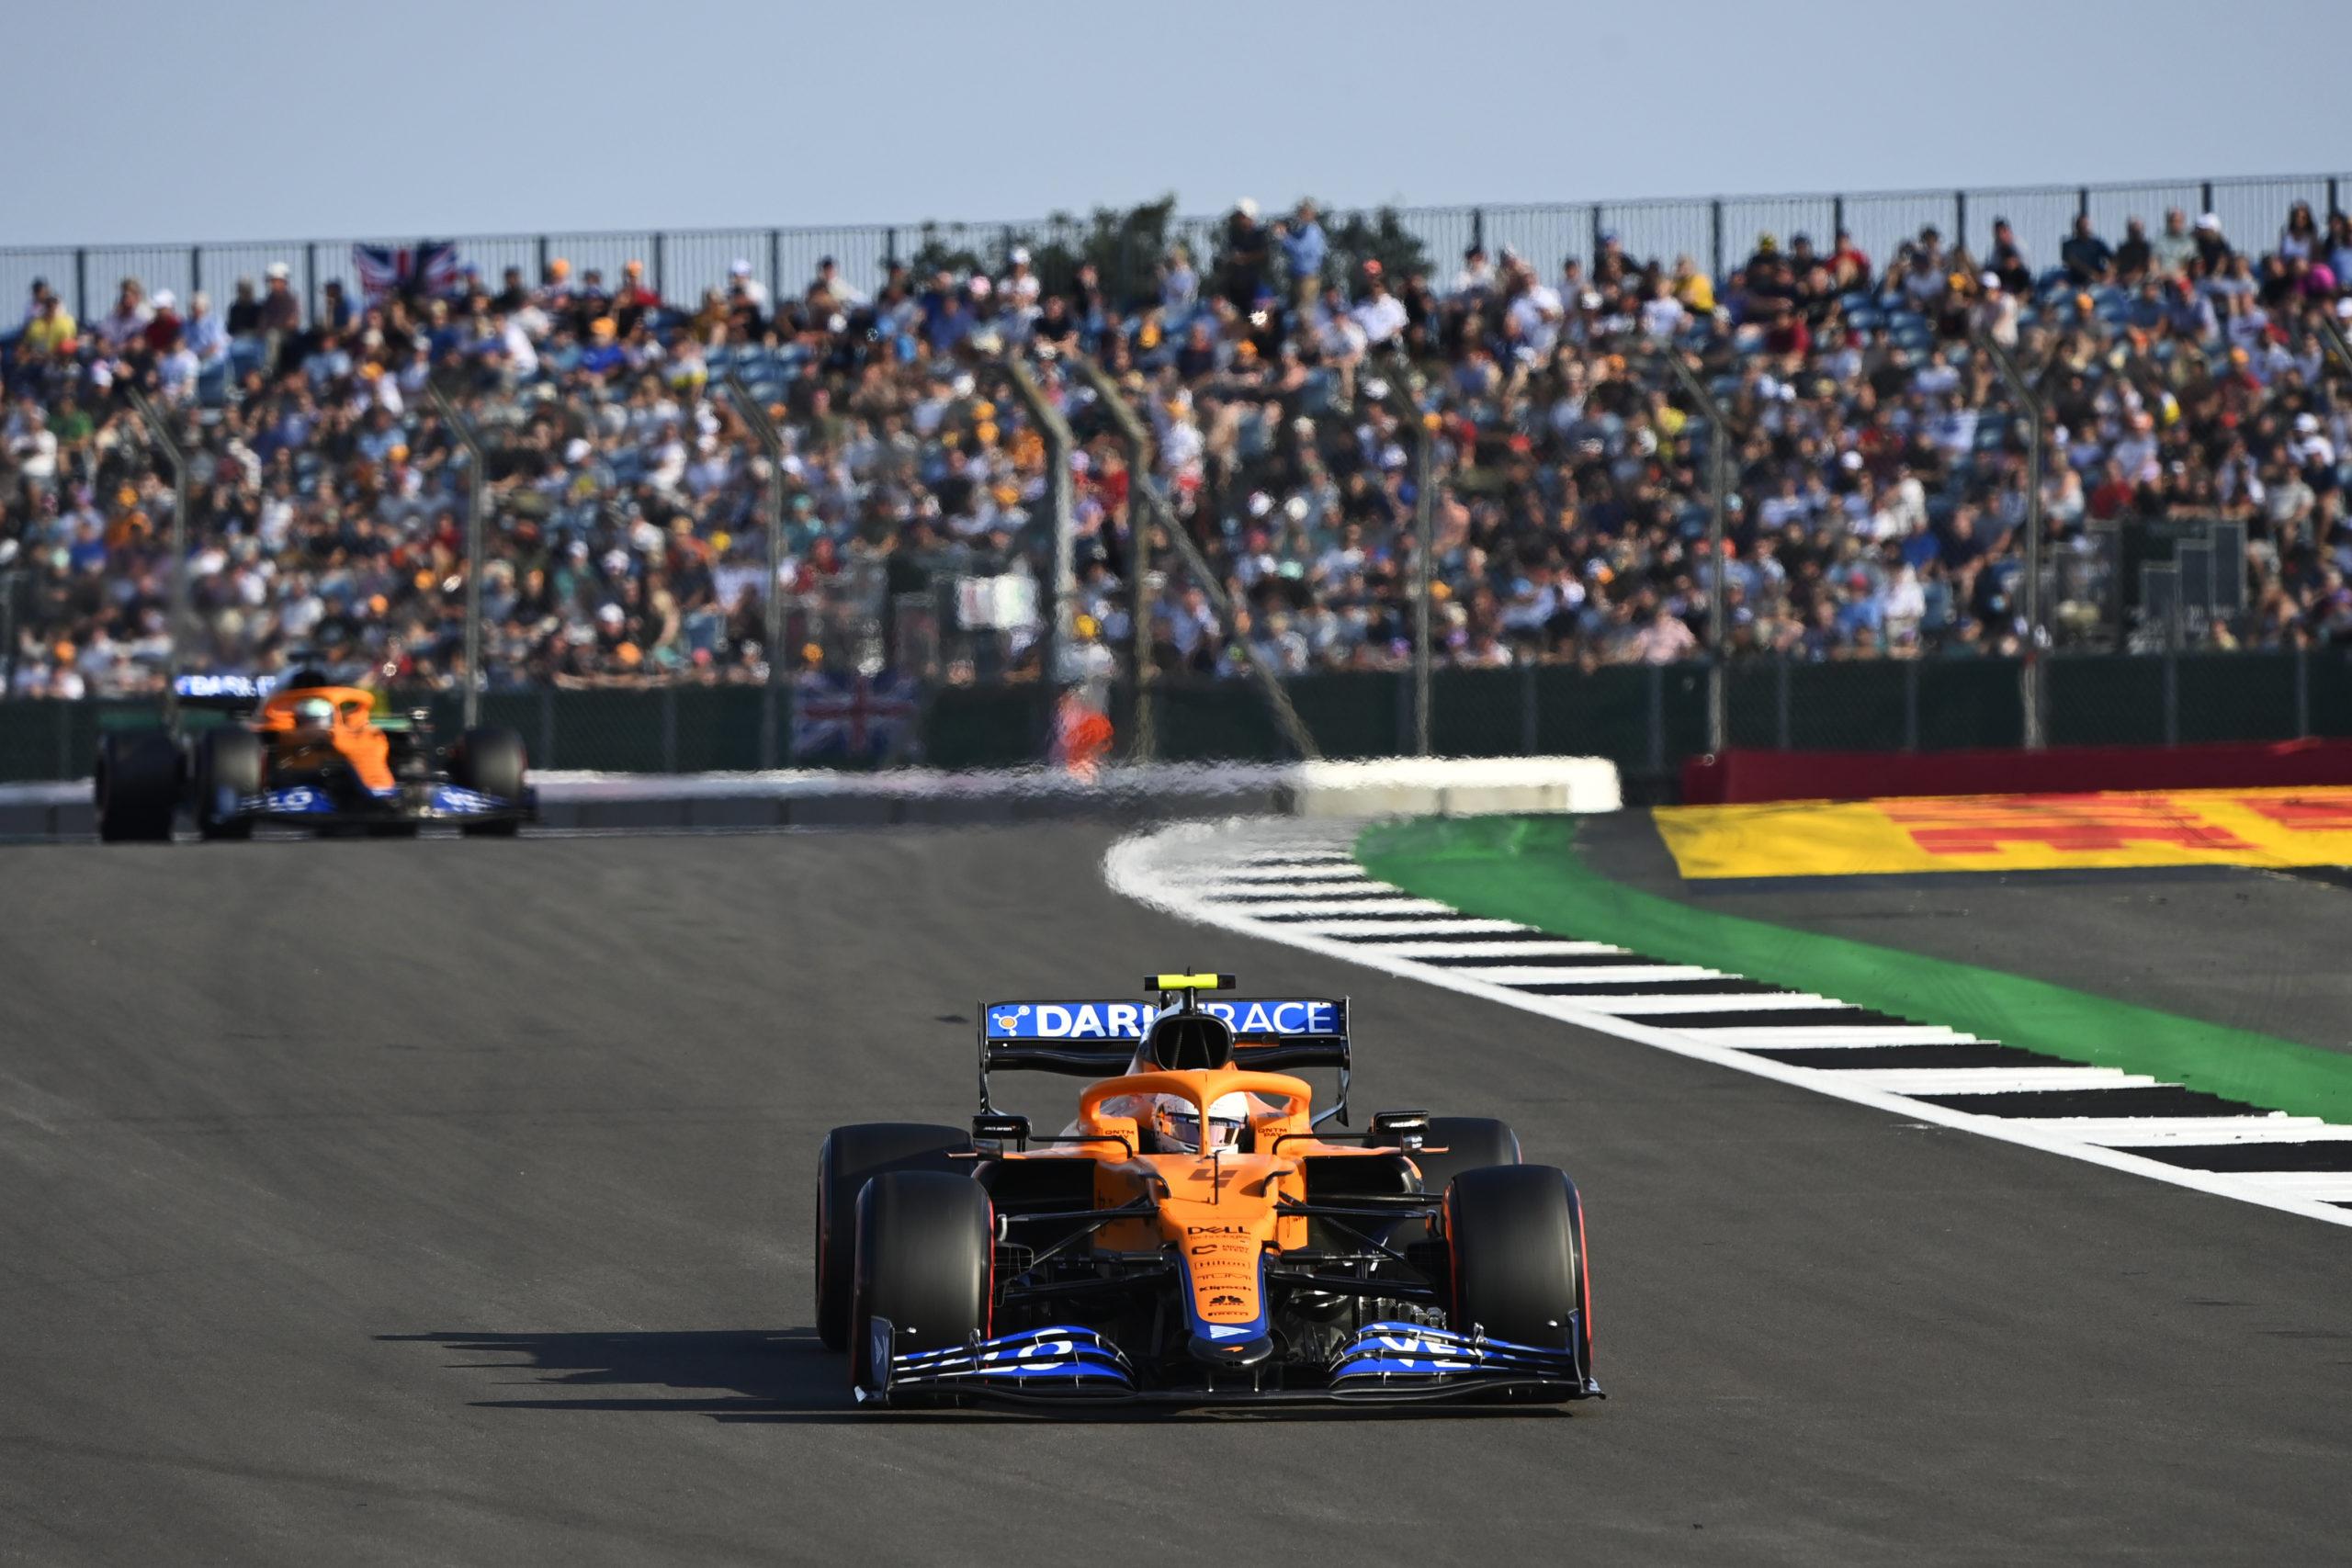 Lando Norris, McLaren MCL35M, leads Daniel Ricciardo, McLaren MCL35M